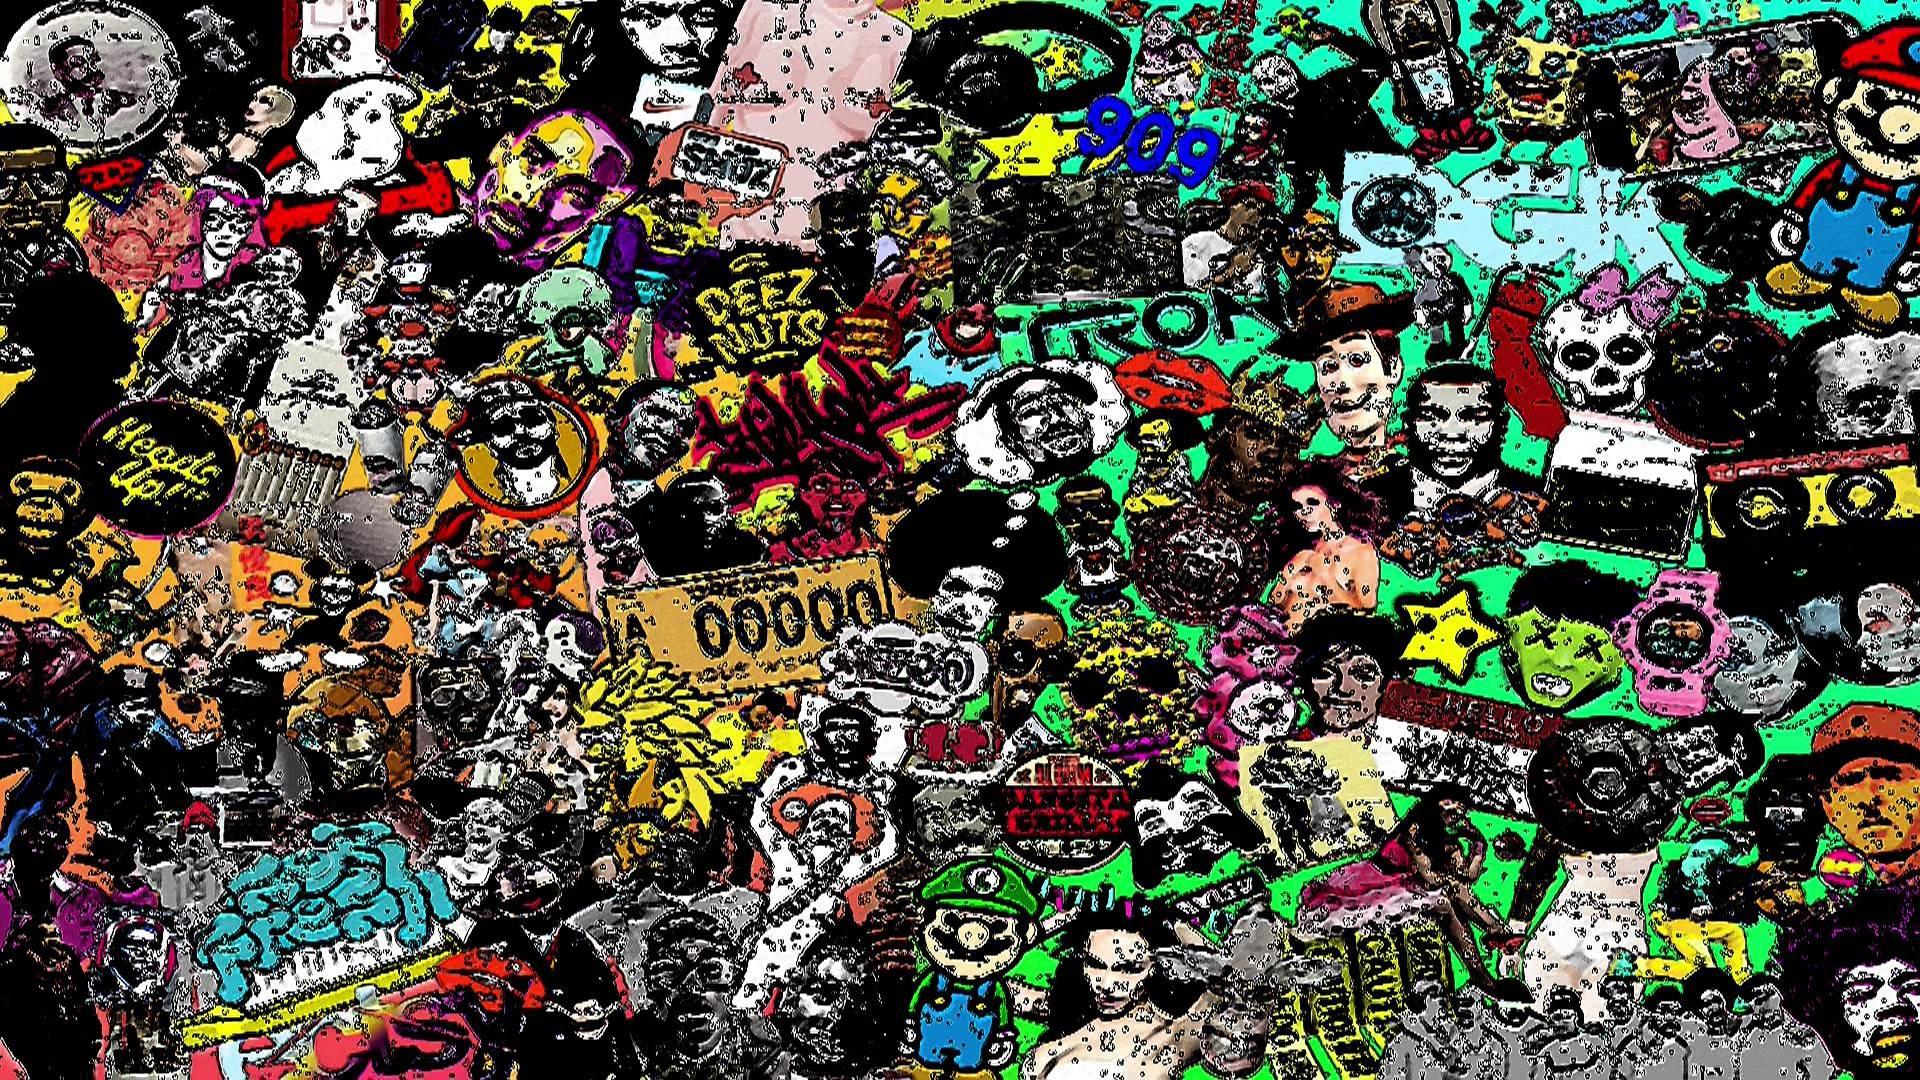 1920x1080 Hip Hop Graffiti Wallpaper